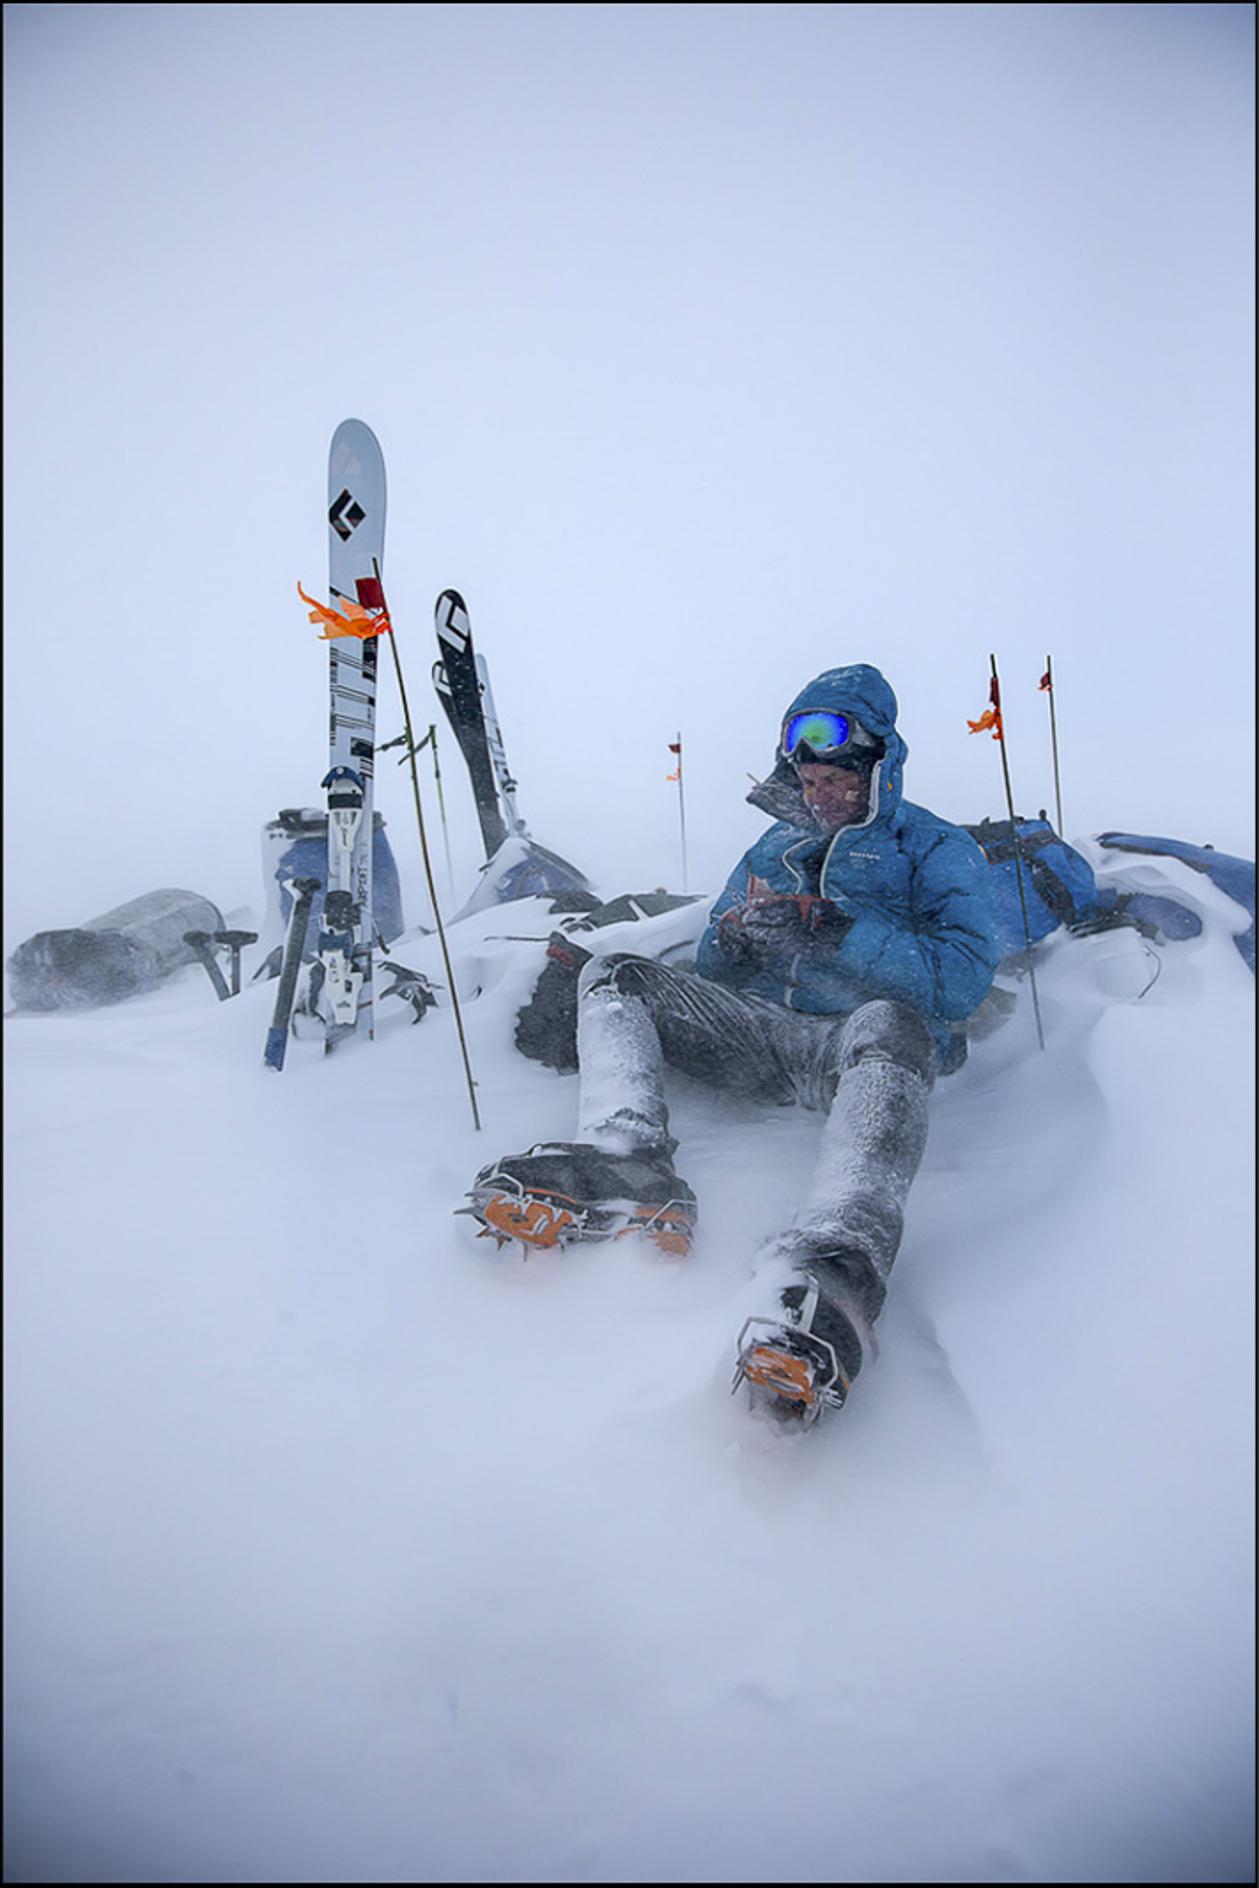 Cory-Richards-Photographer-Antarctica-4.jpg